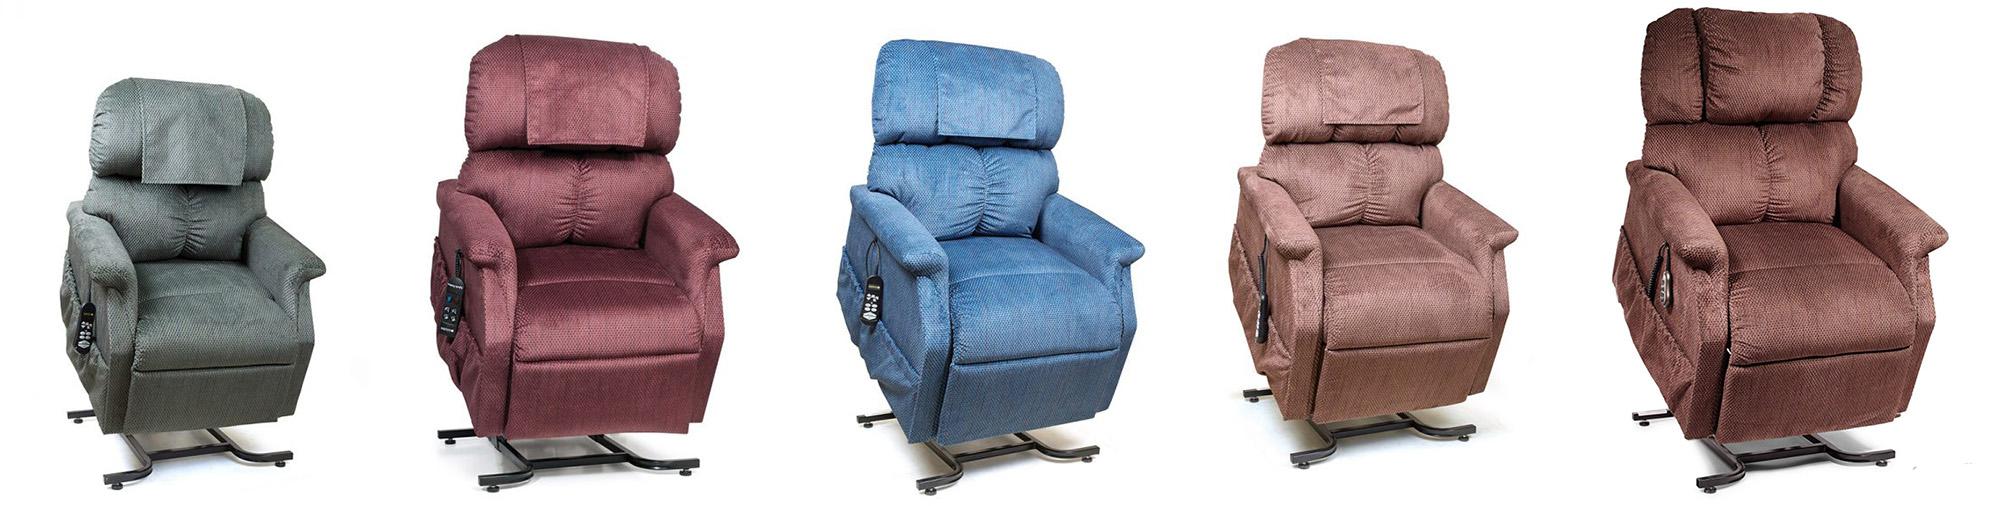 San Francisco CA. Reclining Seat Lift Chair Recliner